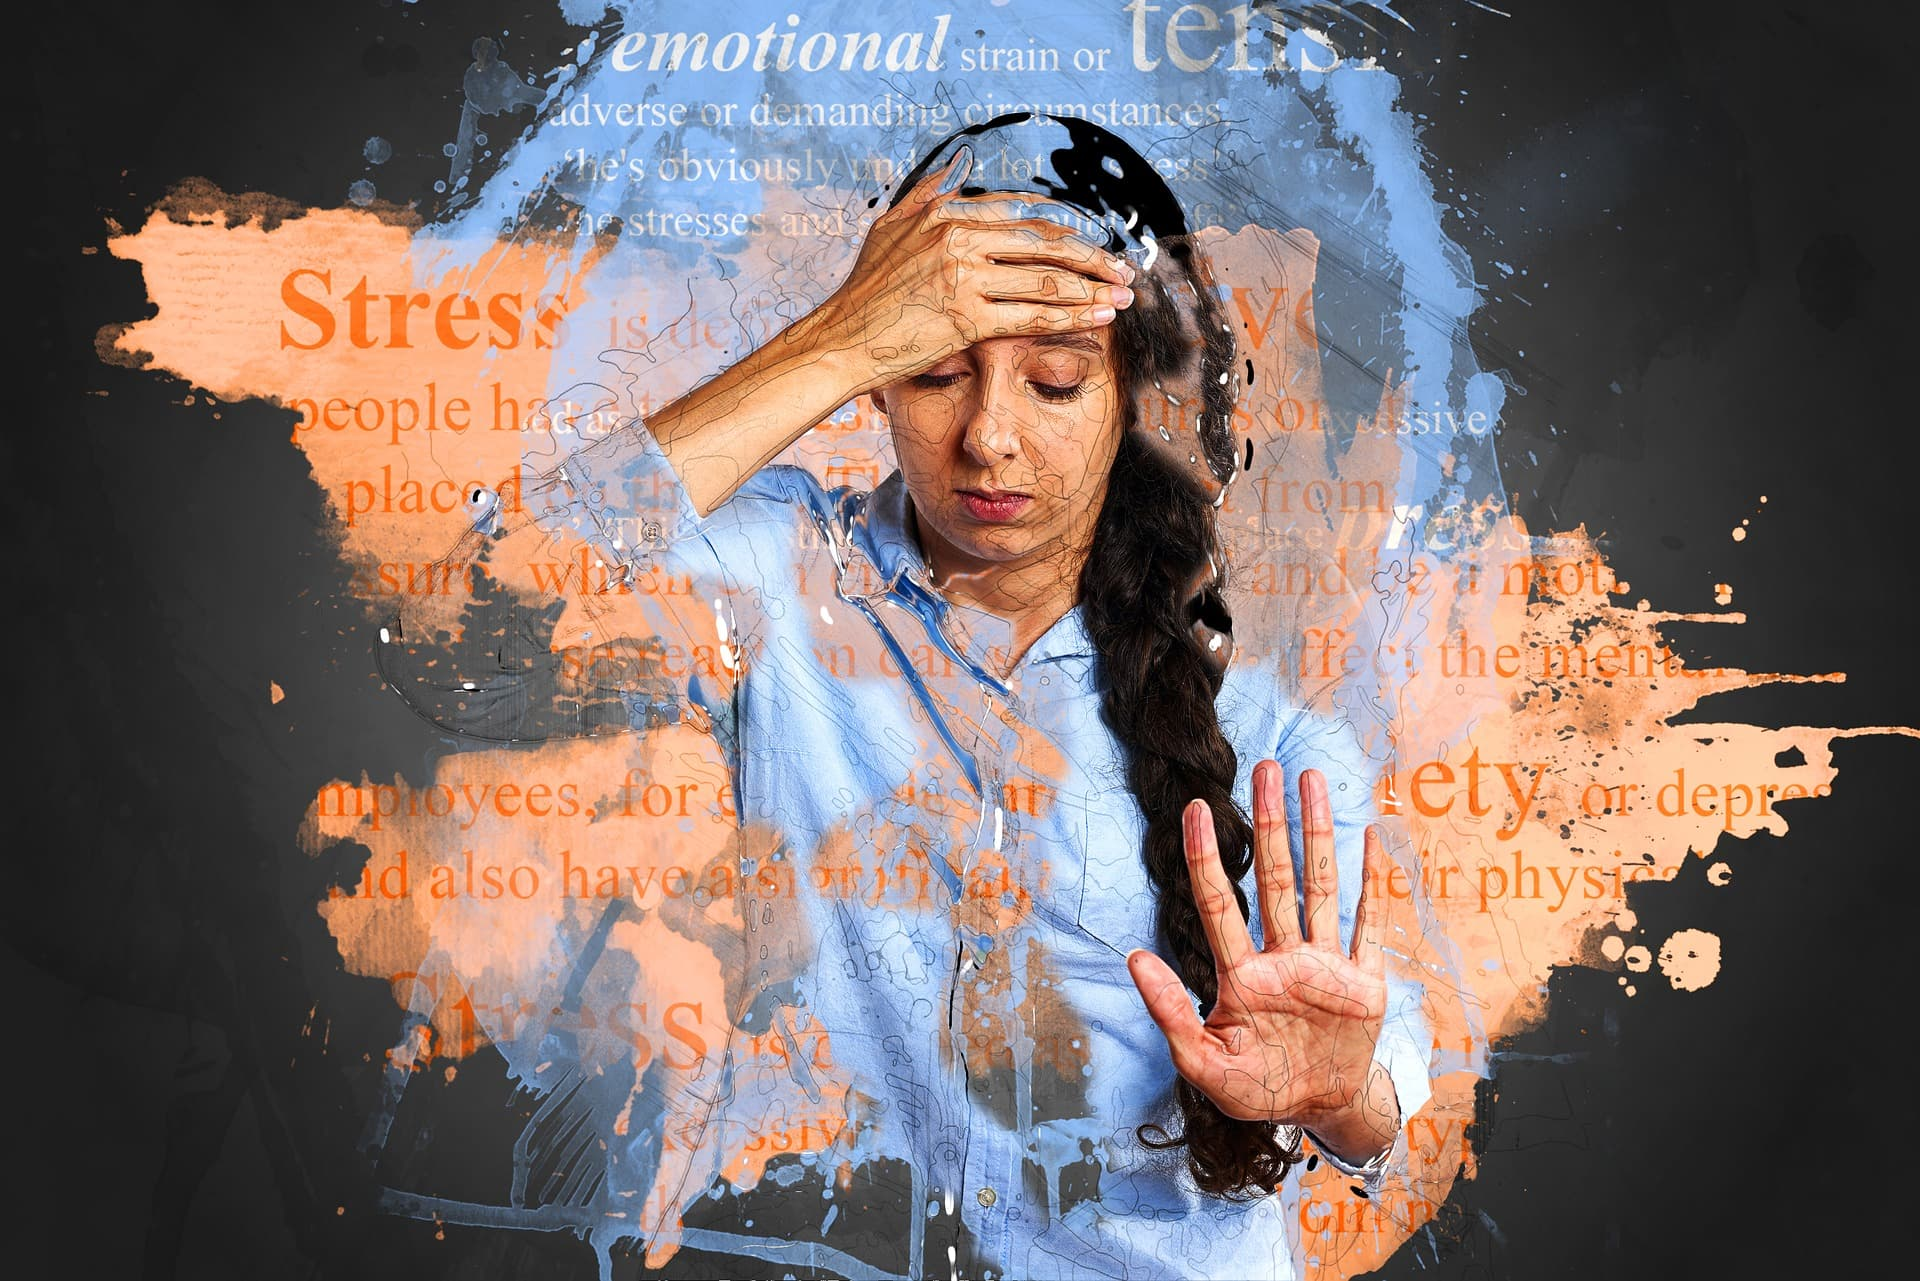 paniekaanval symptomen